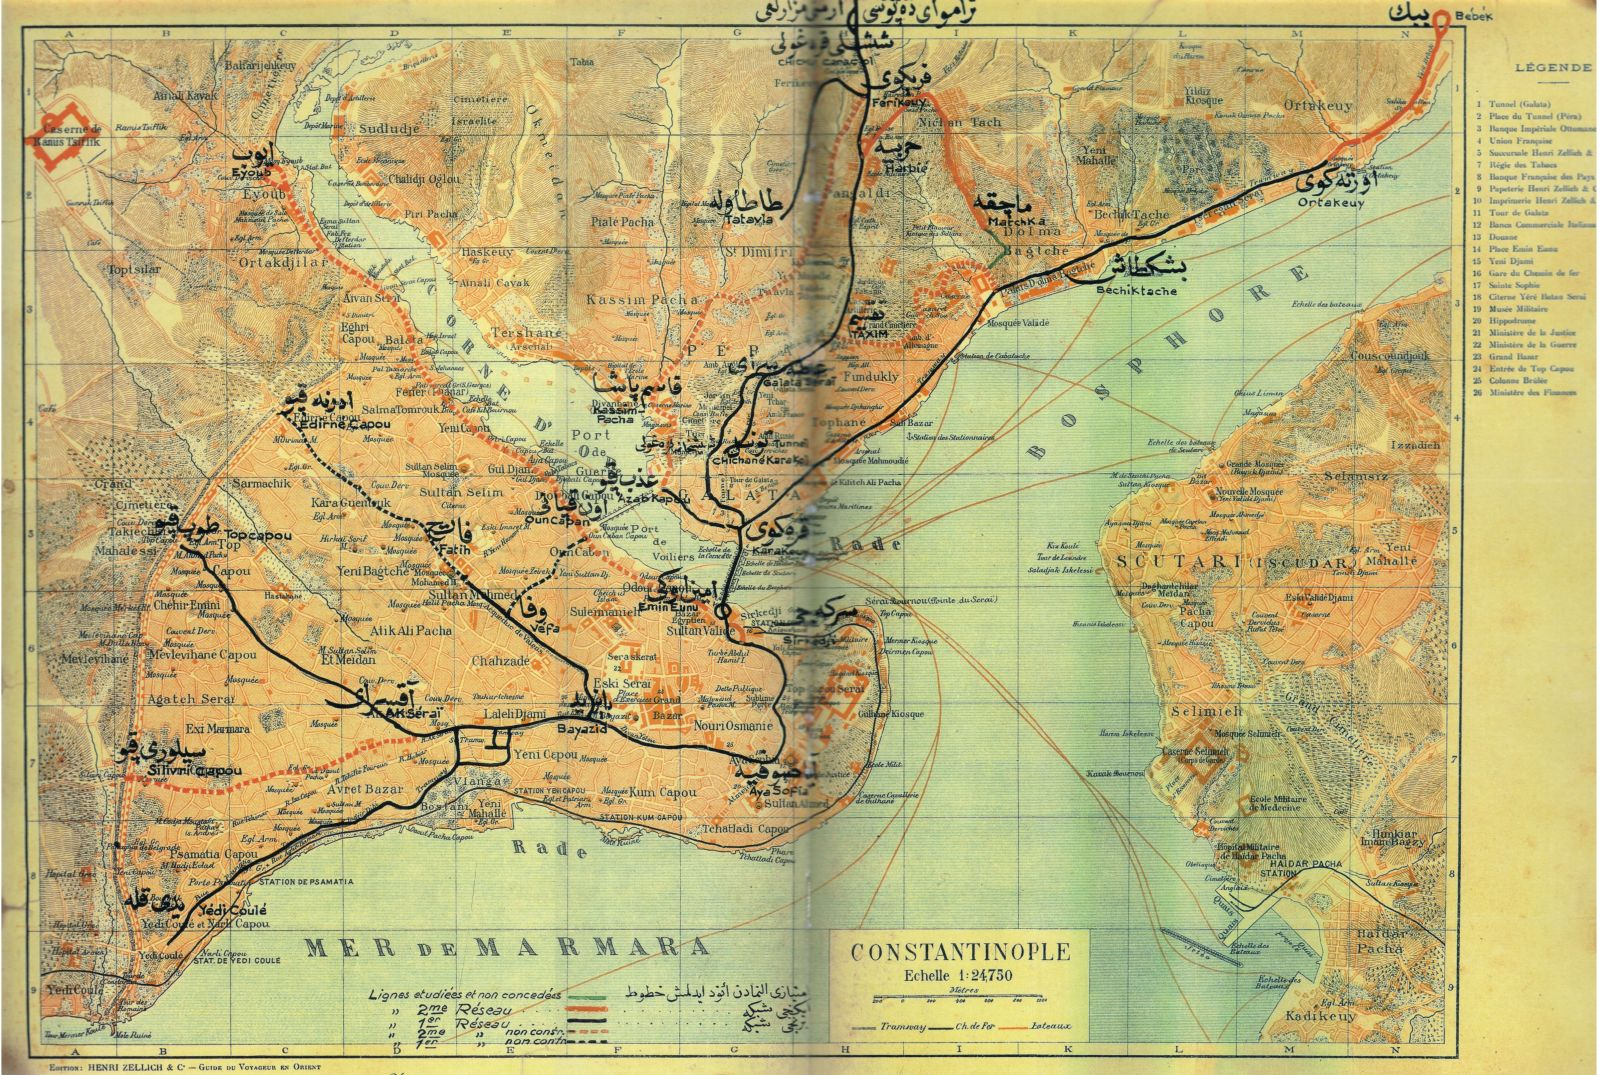 Istanbul tram map 1920 Trains of Turkey